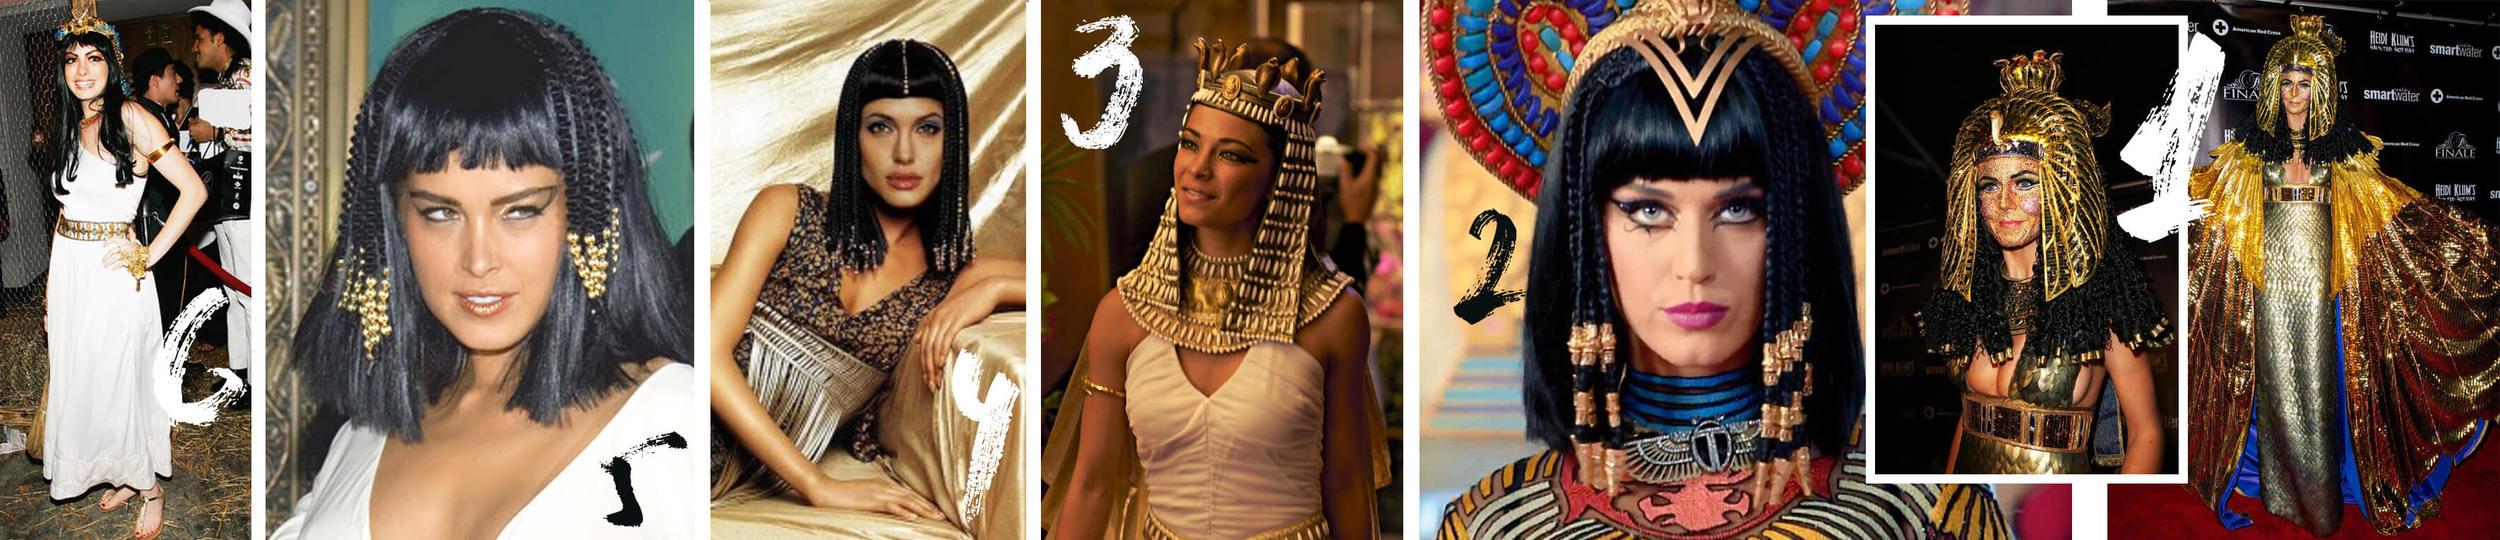 6. Anne Hathaway 5. Petra Nemcova 4. Angelina Jolie 3. Kristin Kreuk 2. Katy Perry 1. Heidi Klum